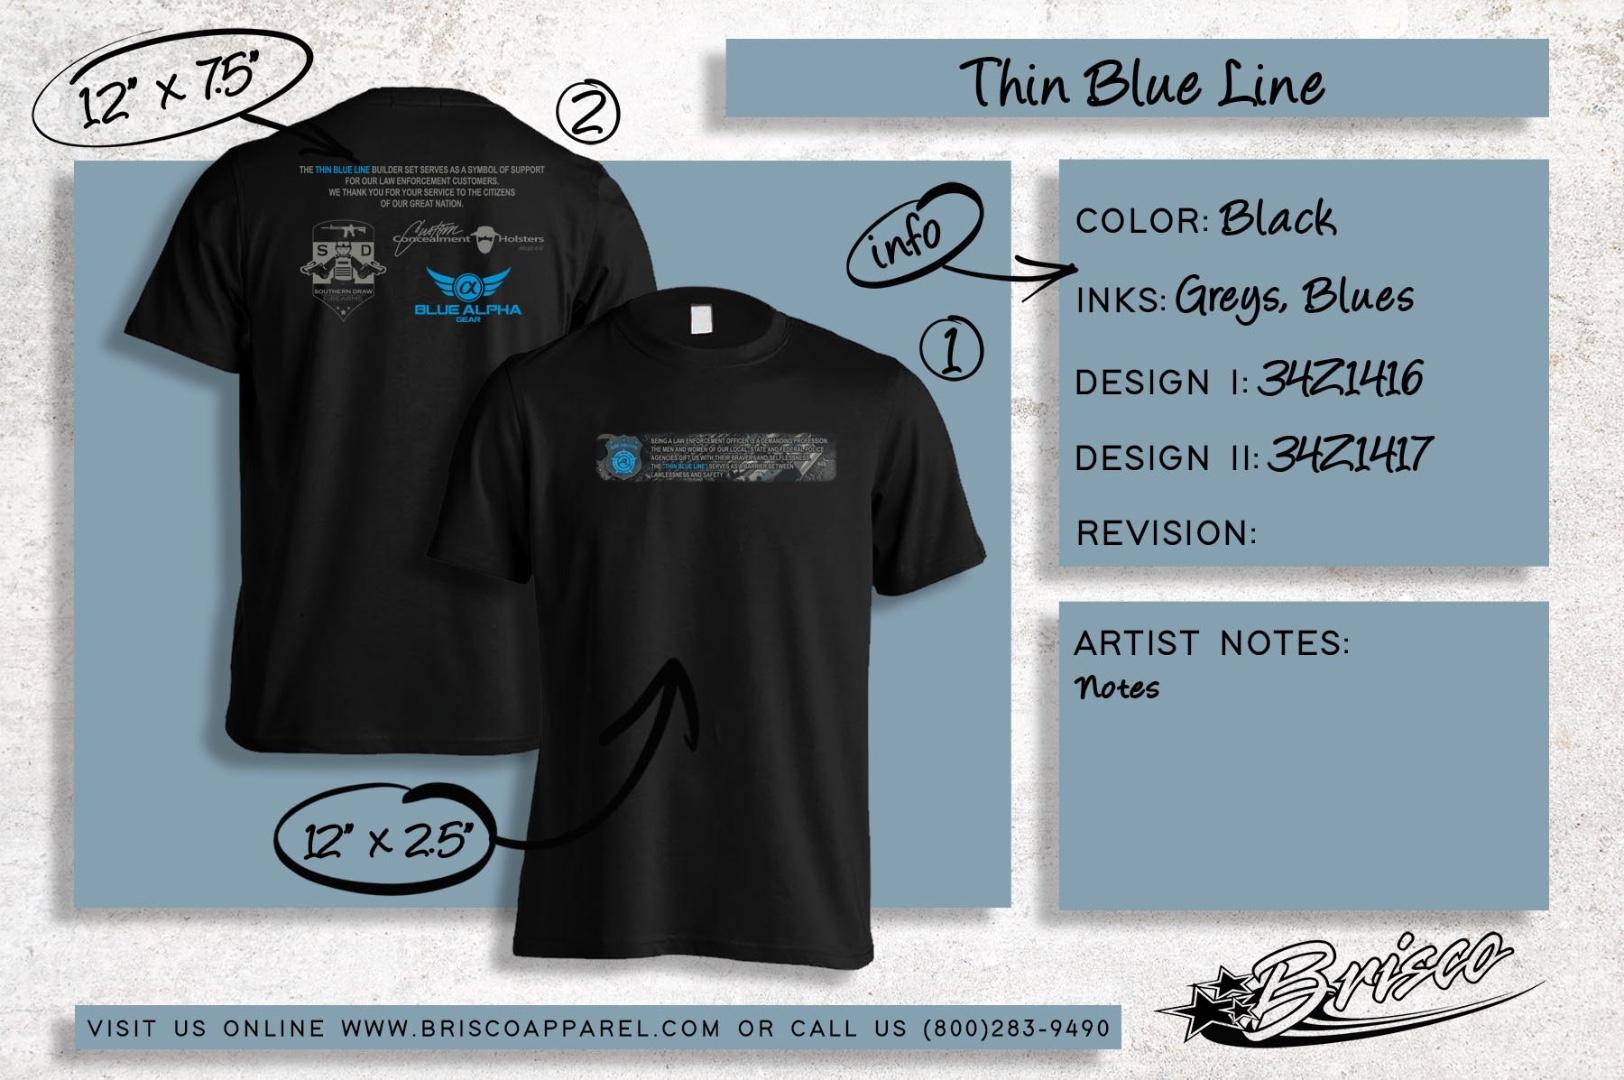 34Z1416 34Z1417 - Thin Blue Line - Proof - Black Shirt.jpg